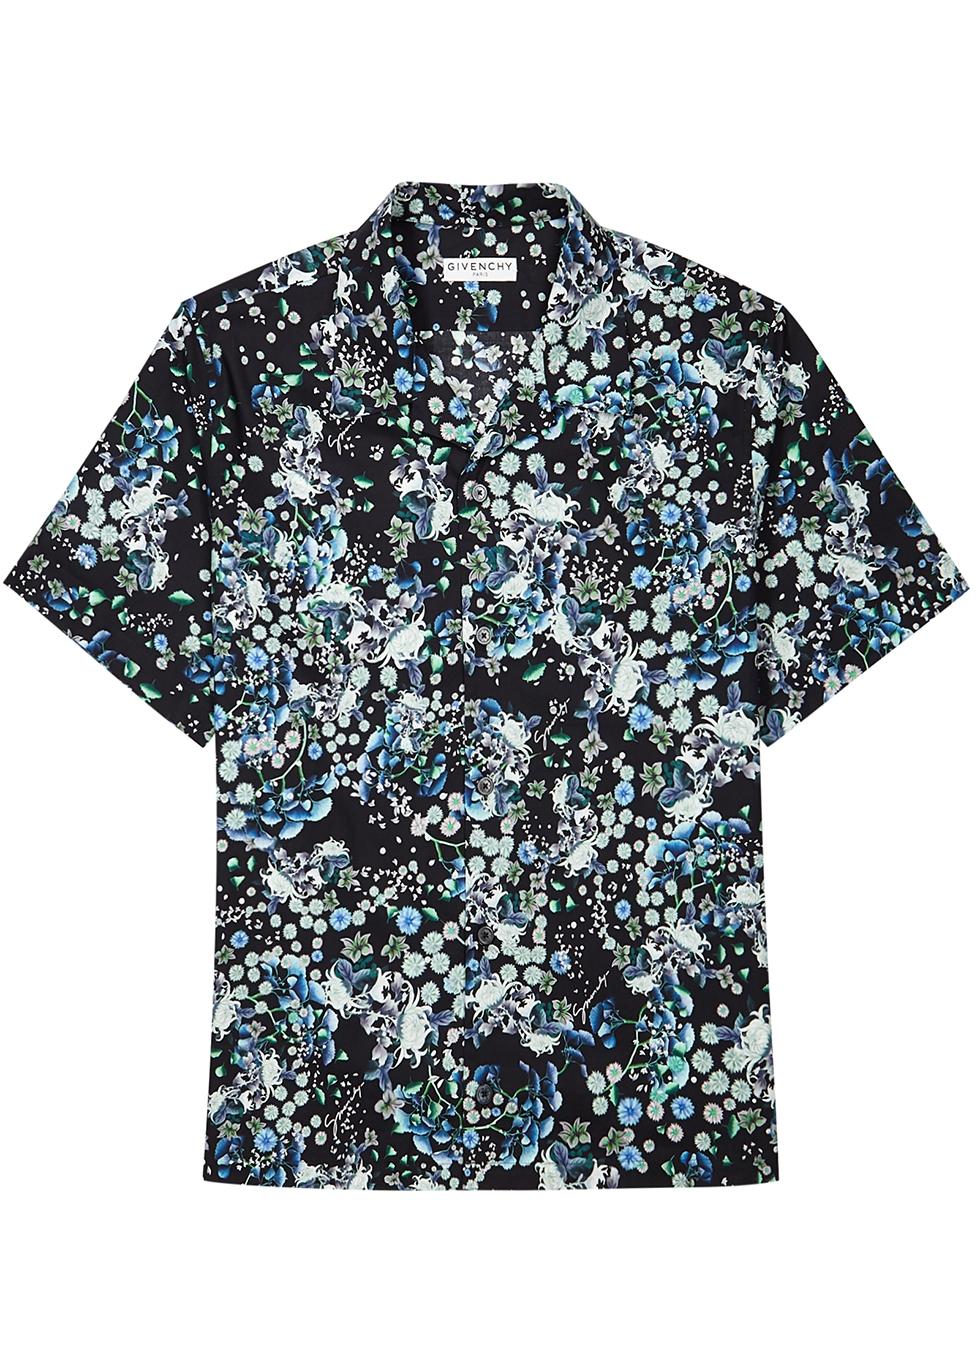 Black floral-print cotton shirt